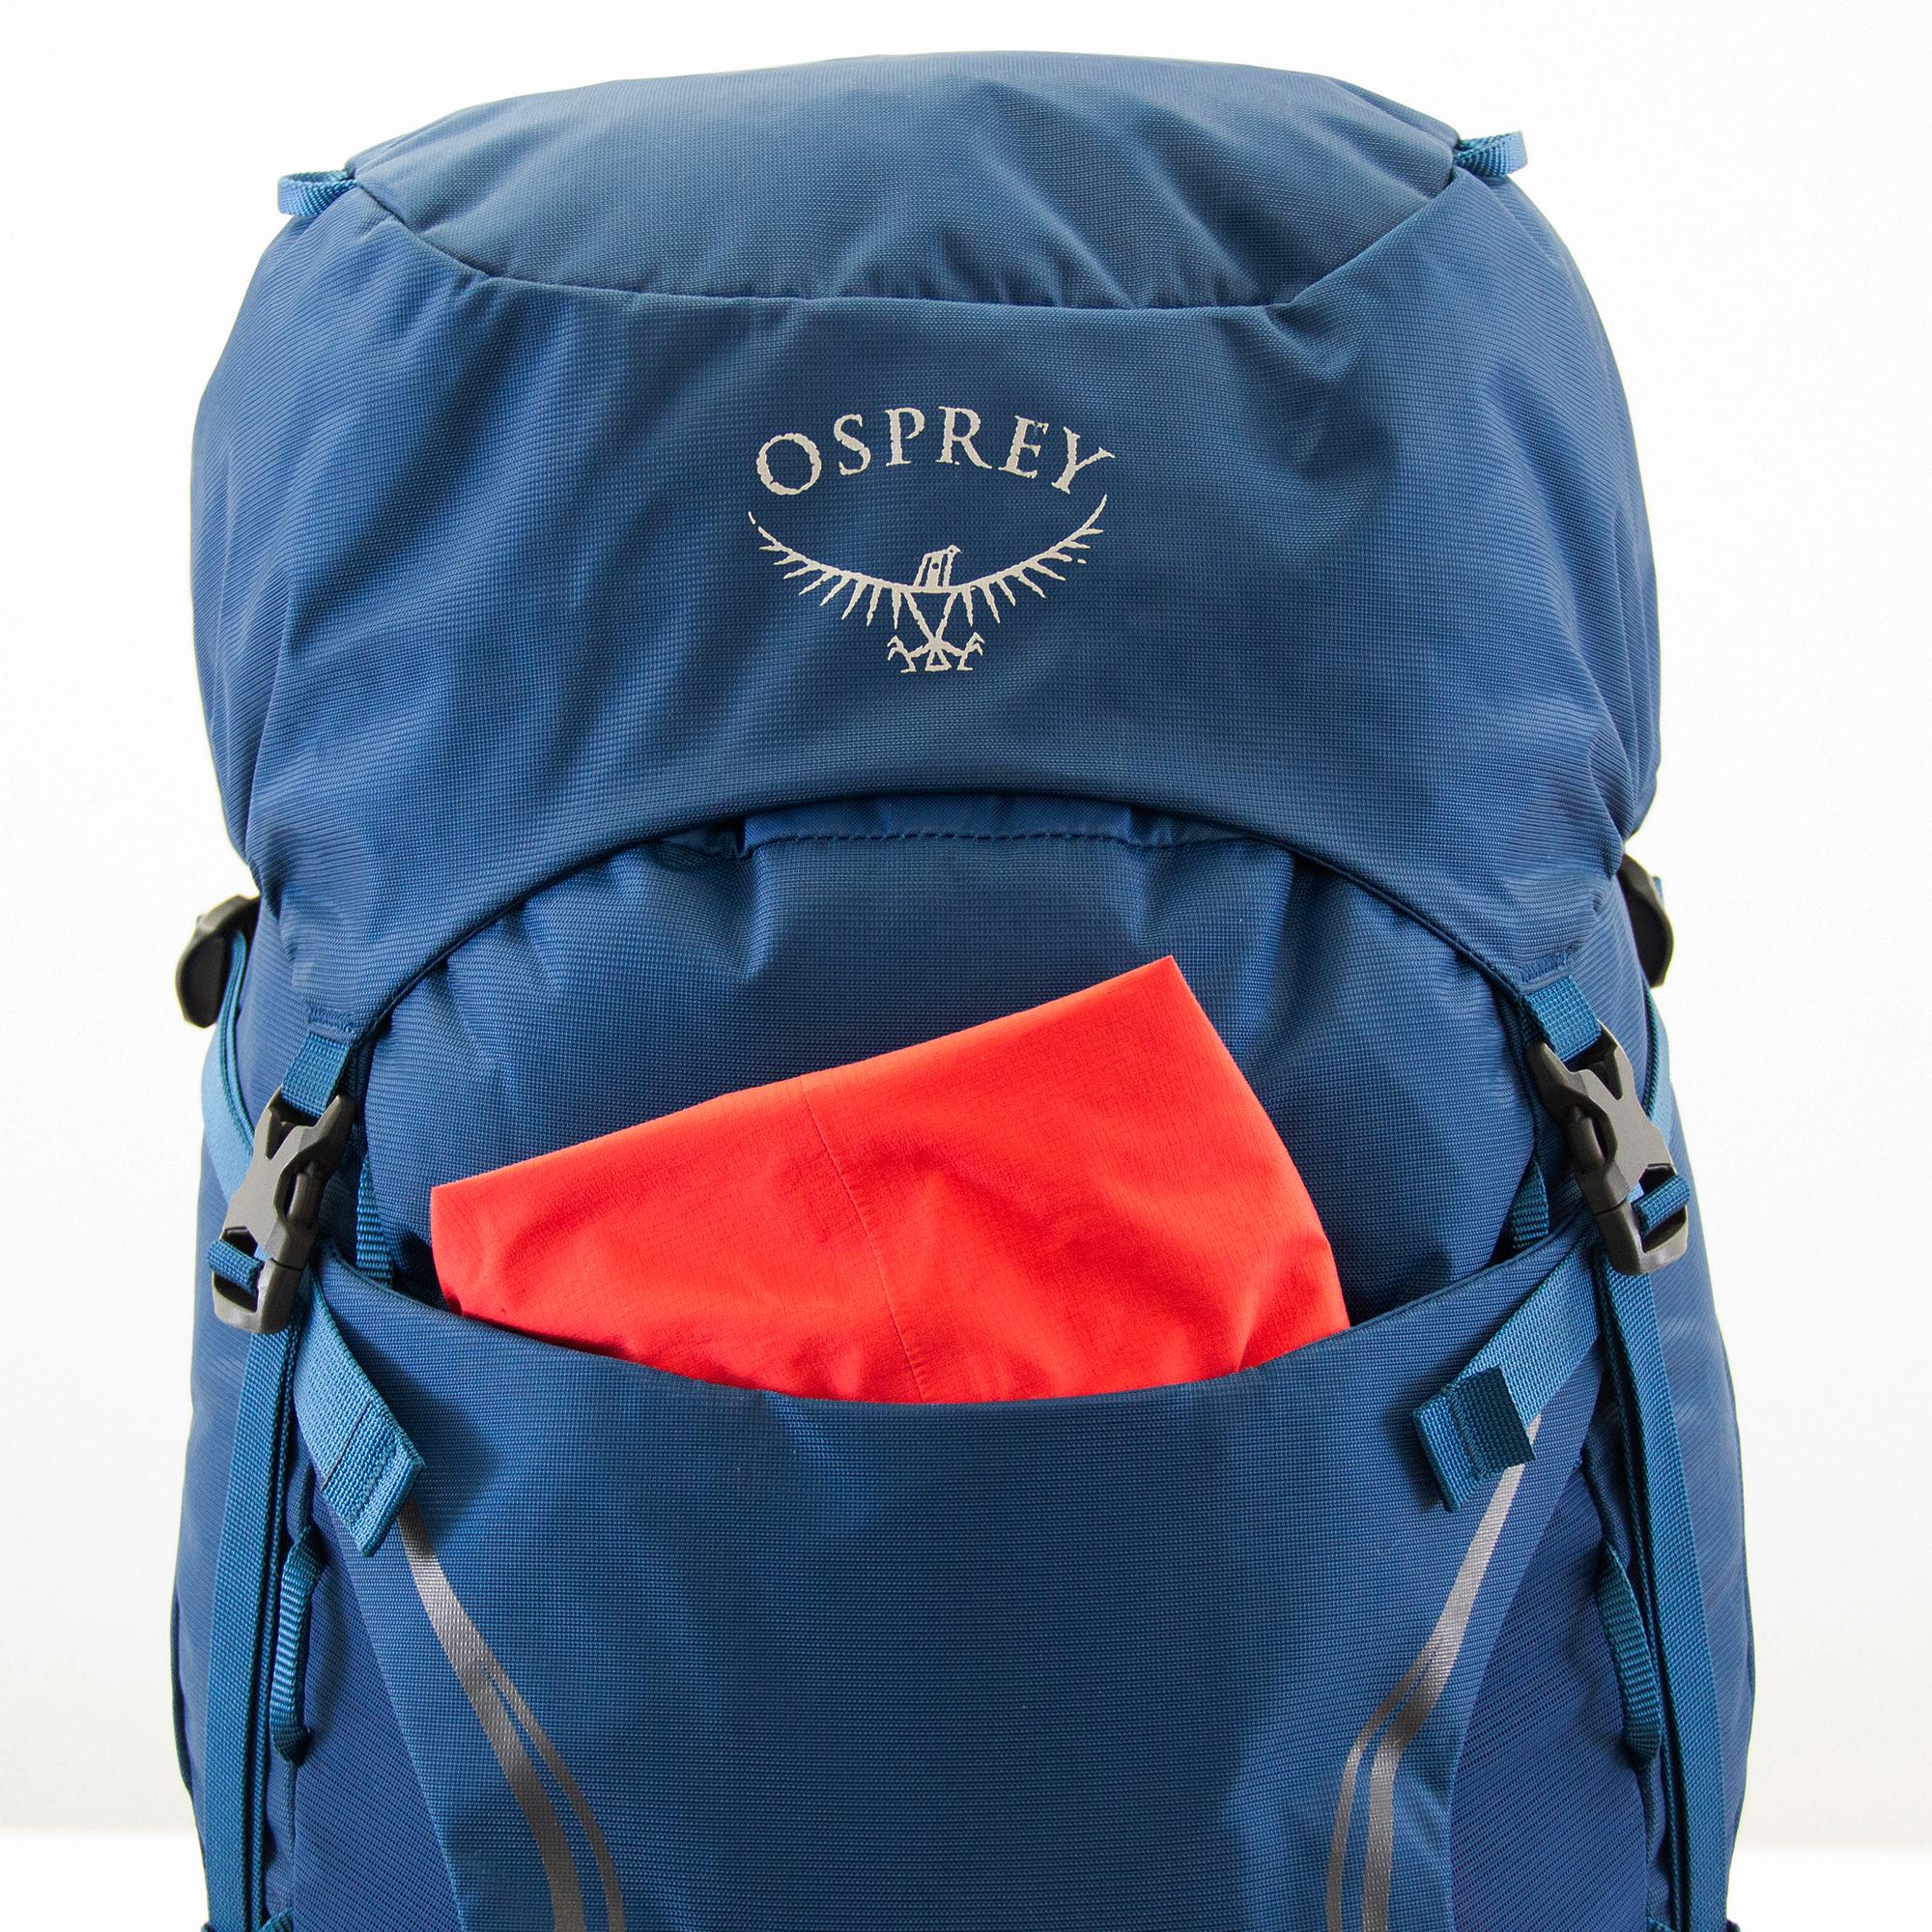 Osprey - Kestrel 48, Mehrtages-Trekkingrucksack für Männer